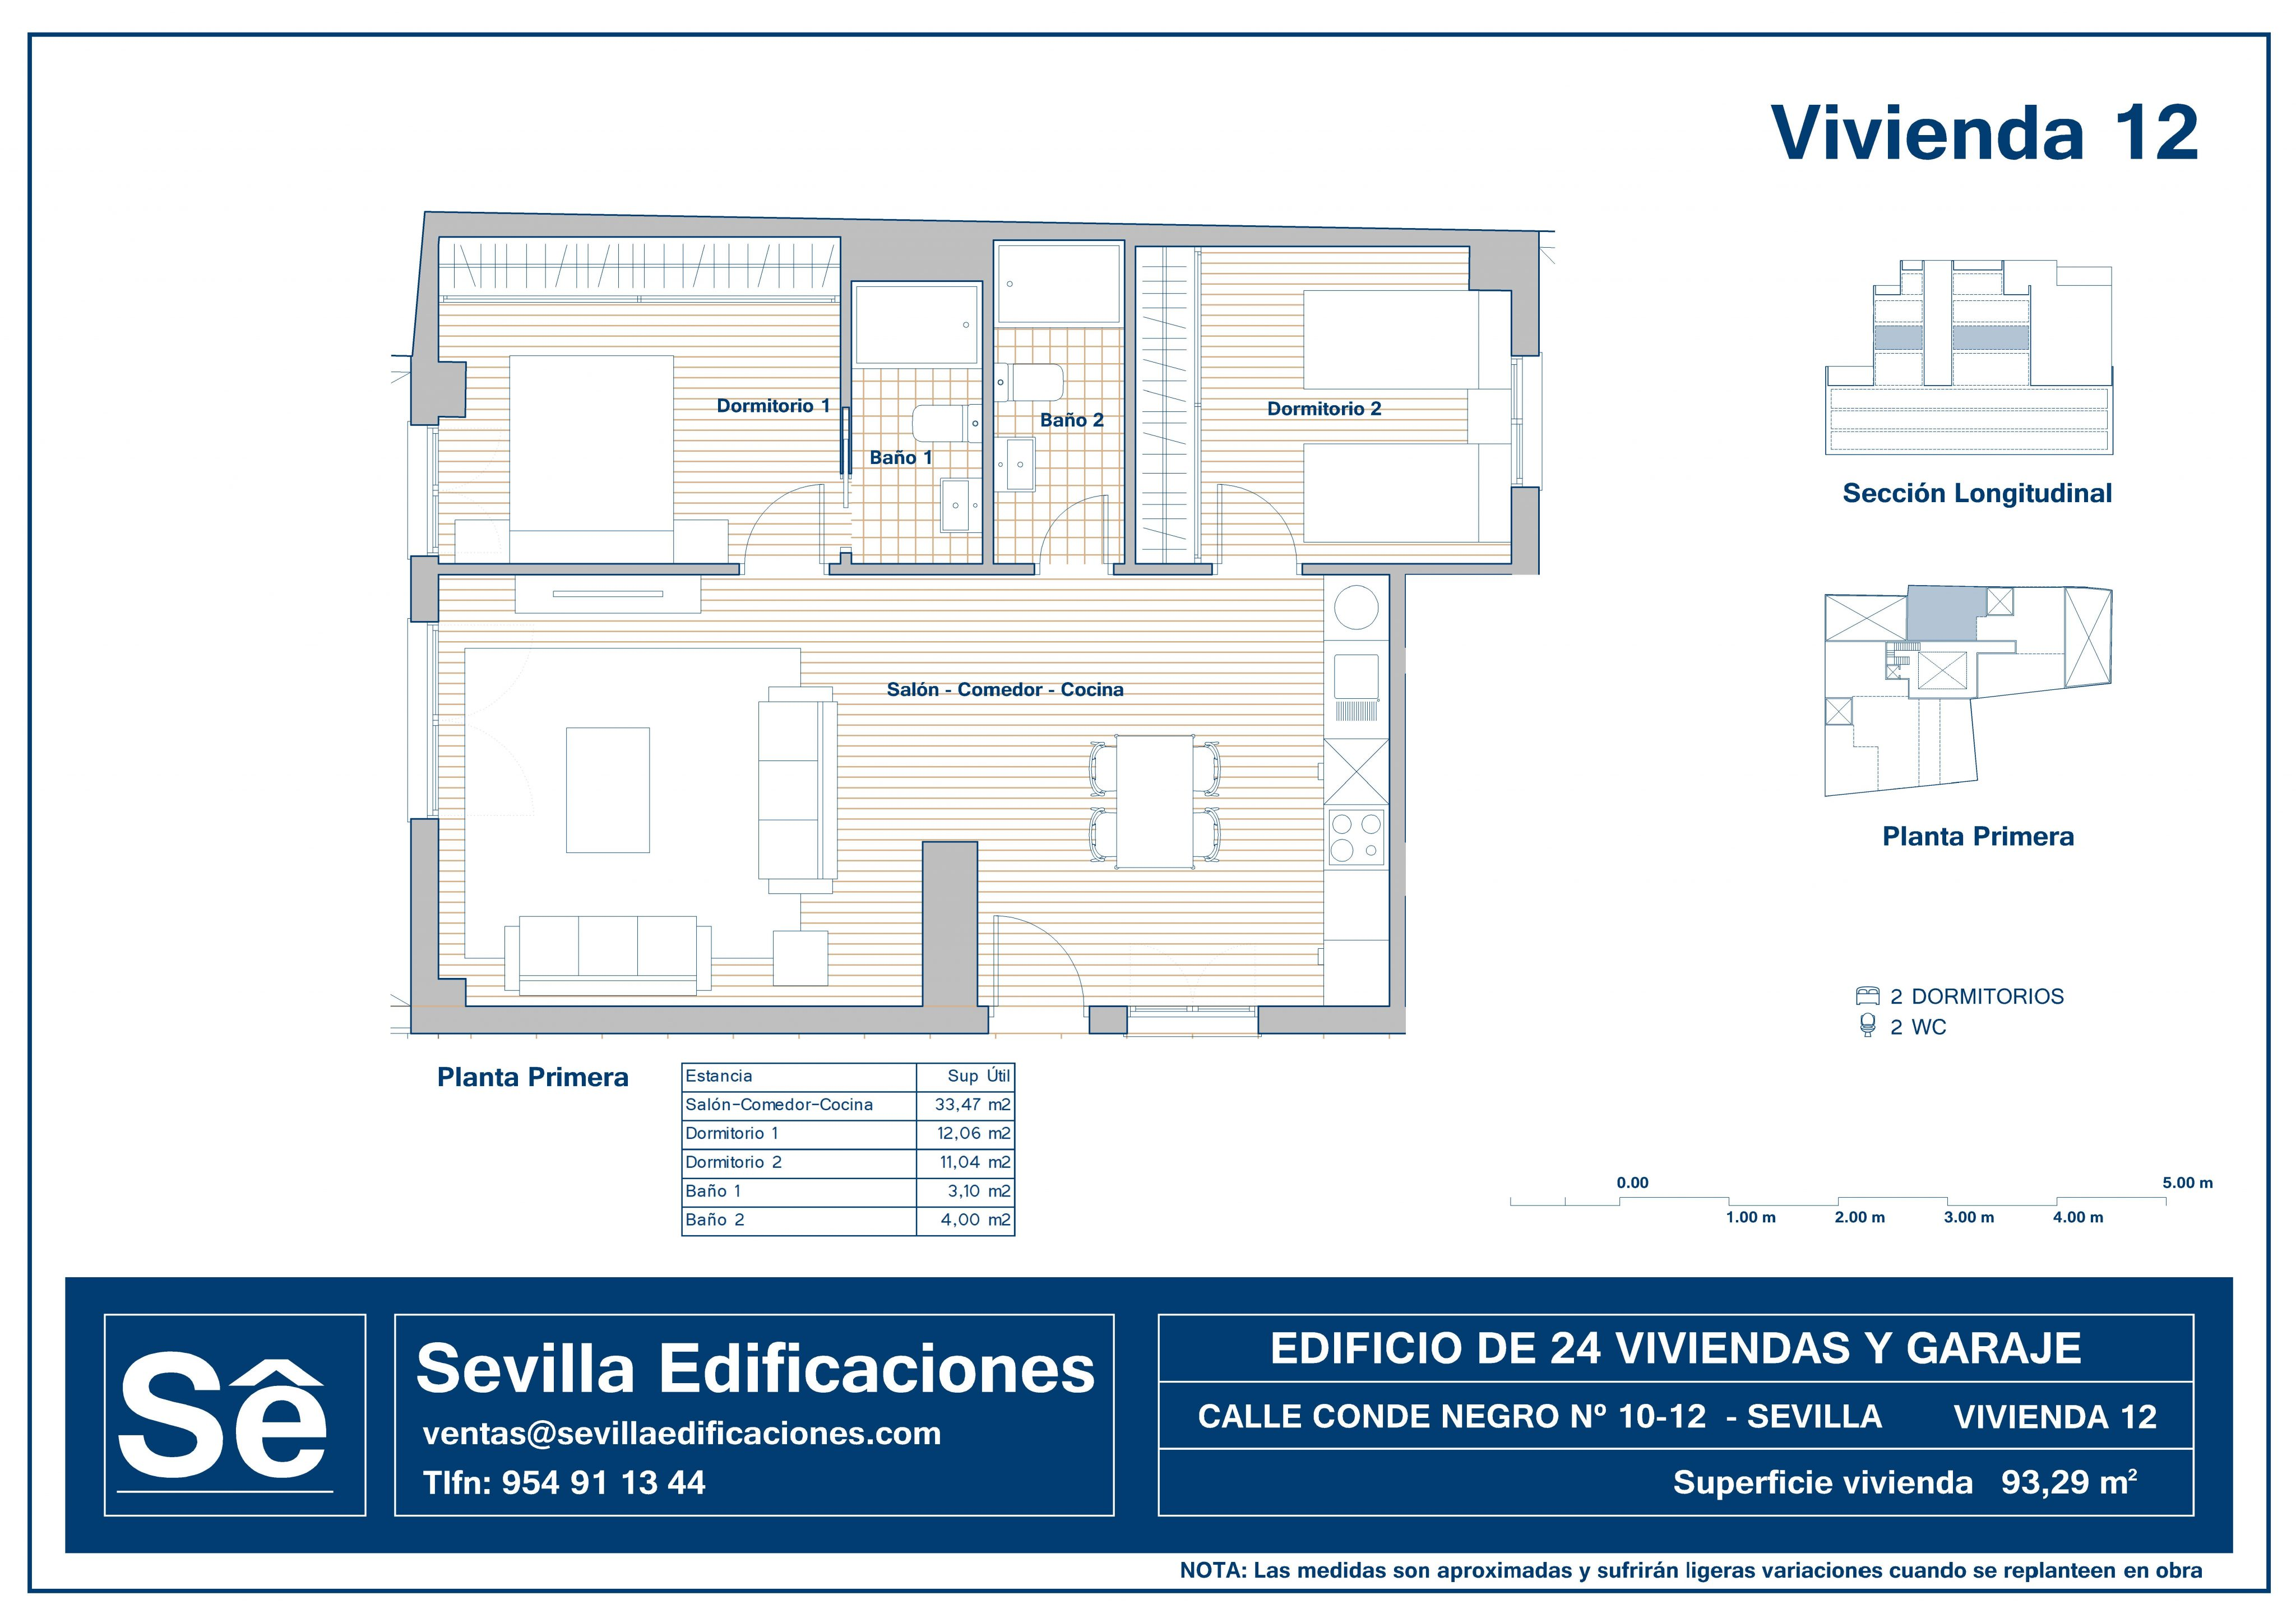 CONDENEGRO_VIVIENDA_12